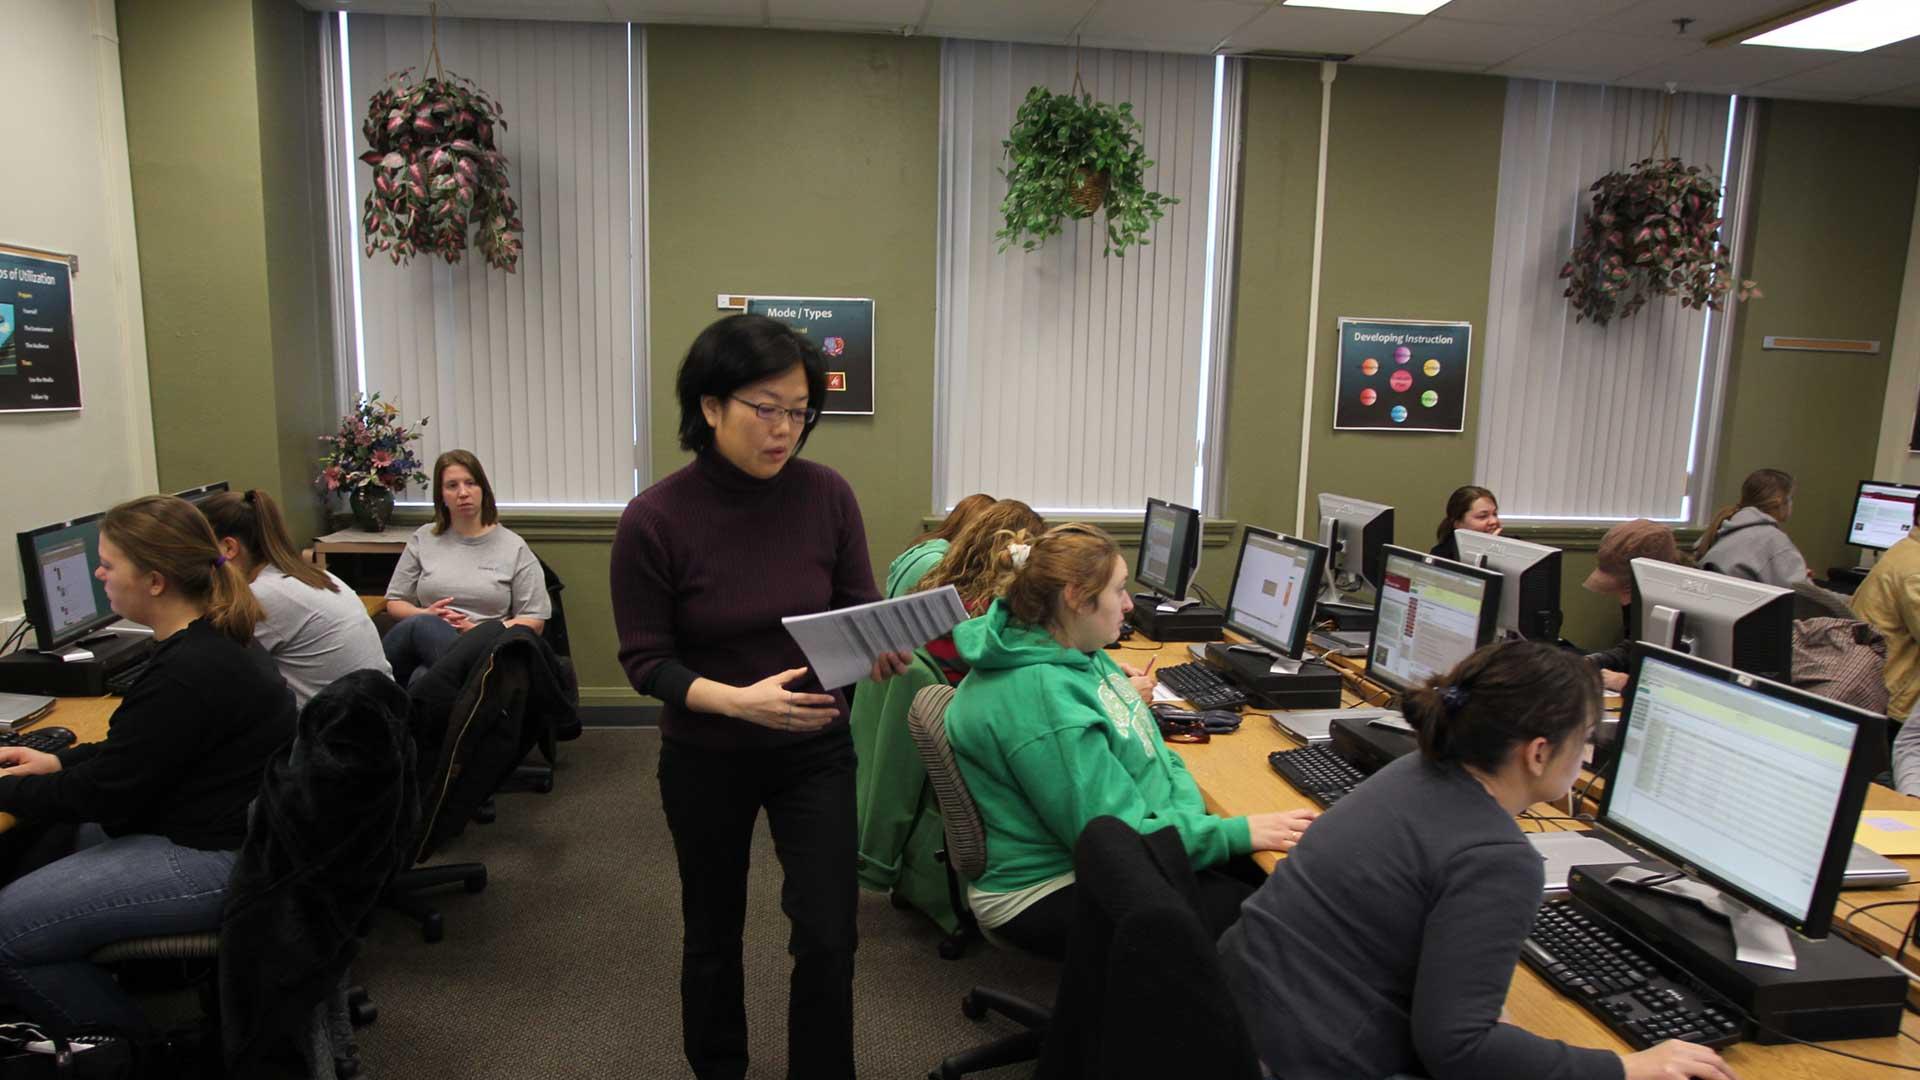 Educational Technology Graduate Program Readings Foundation And Technology Missouri State University